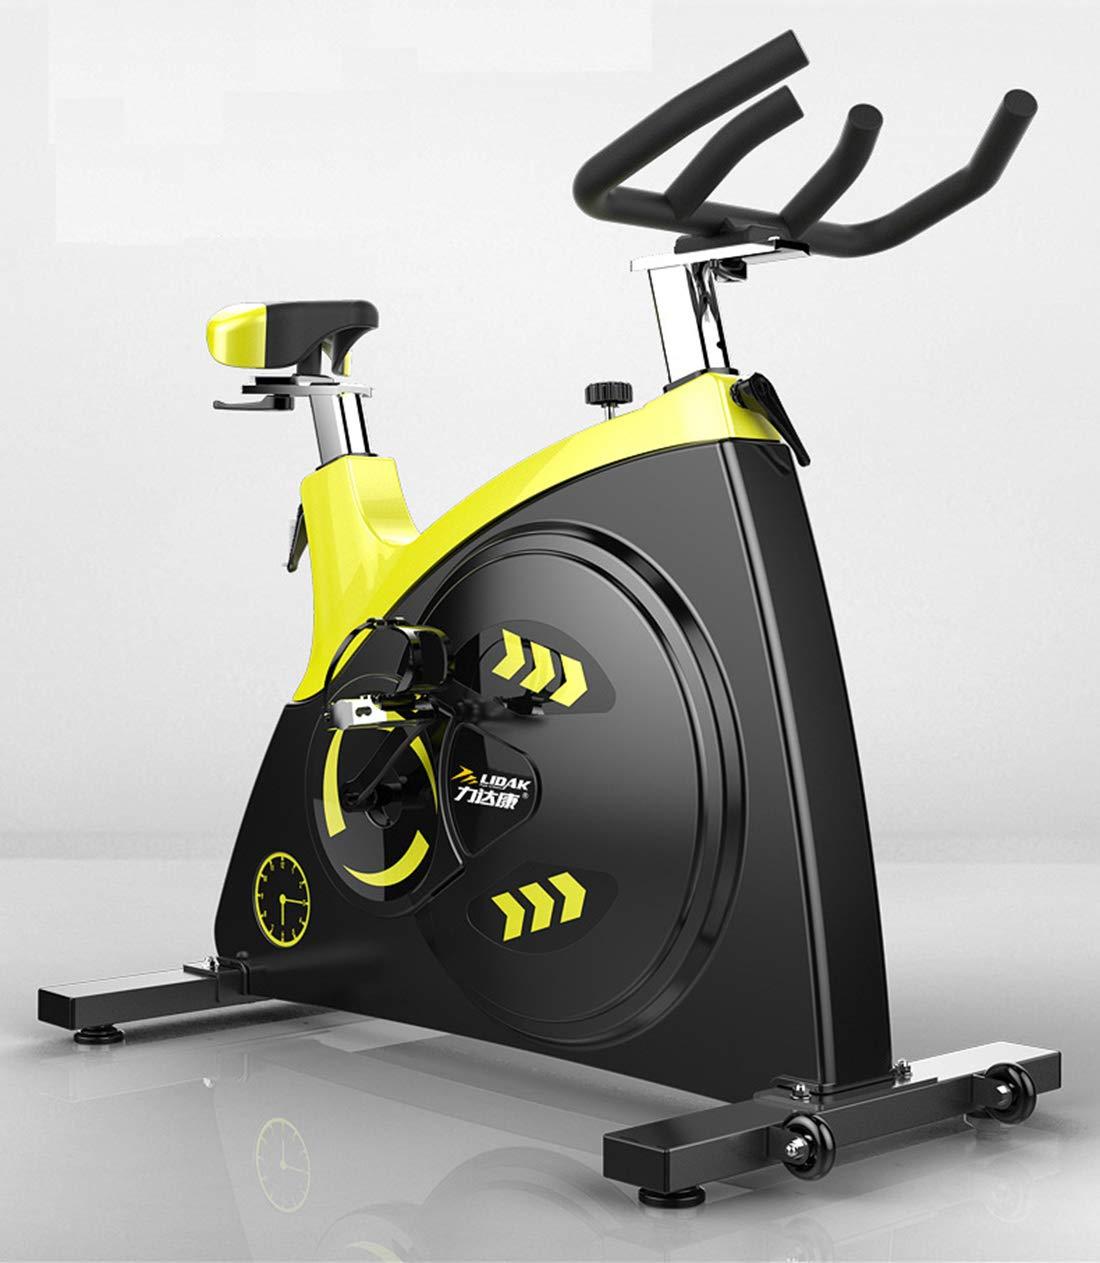 DoubleZhou フィットネスバイク エクササイズバイク マグネティックバイク 有酸素運動 トレーニングマシン エアロバイク 室内自転車   B07QKF578N